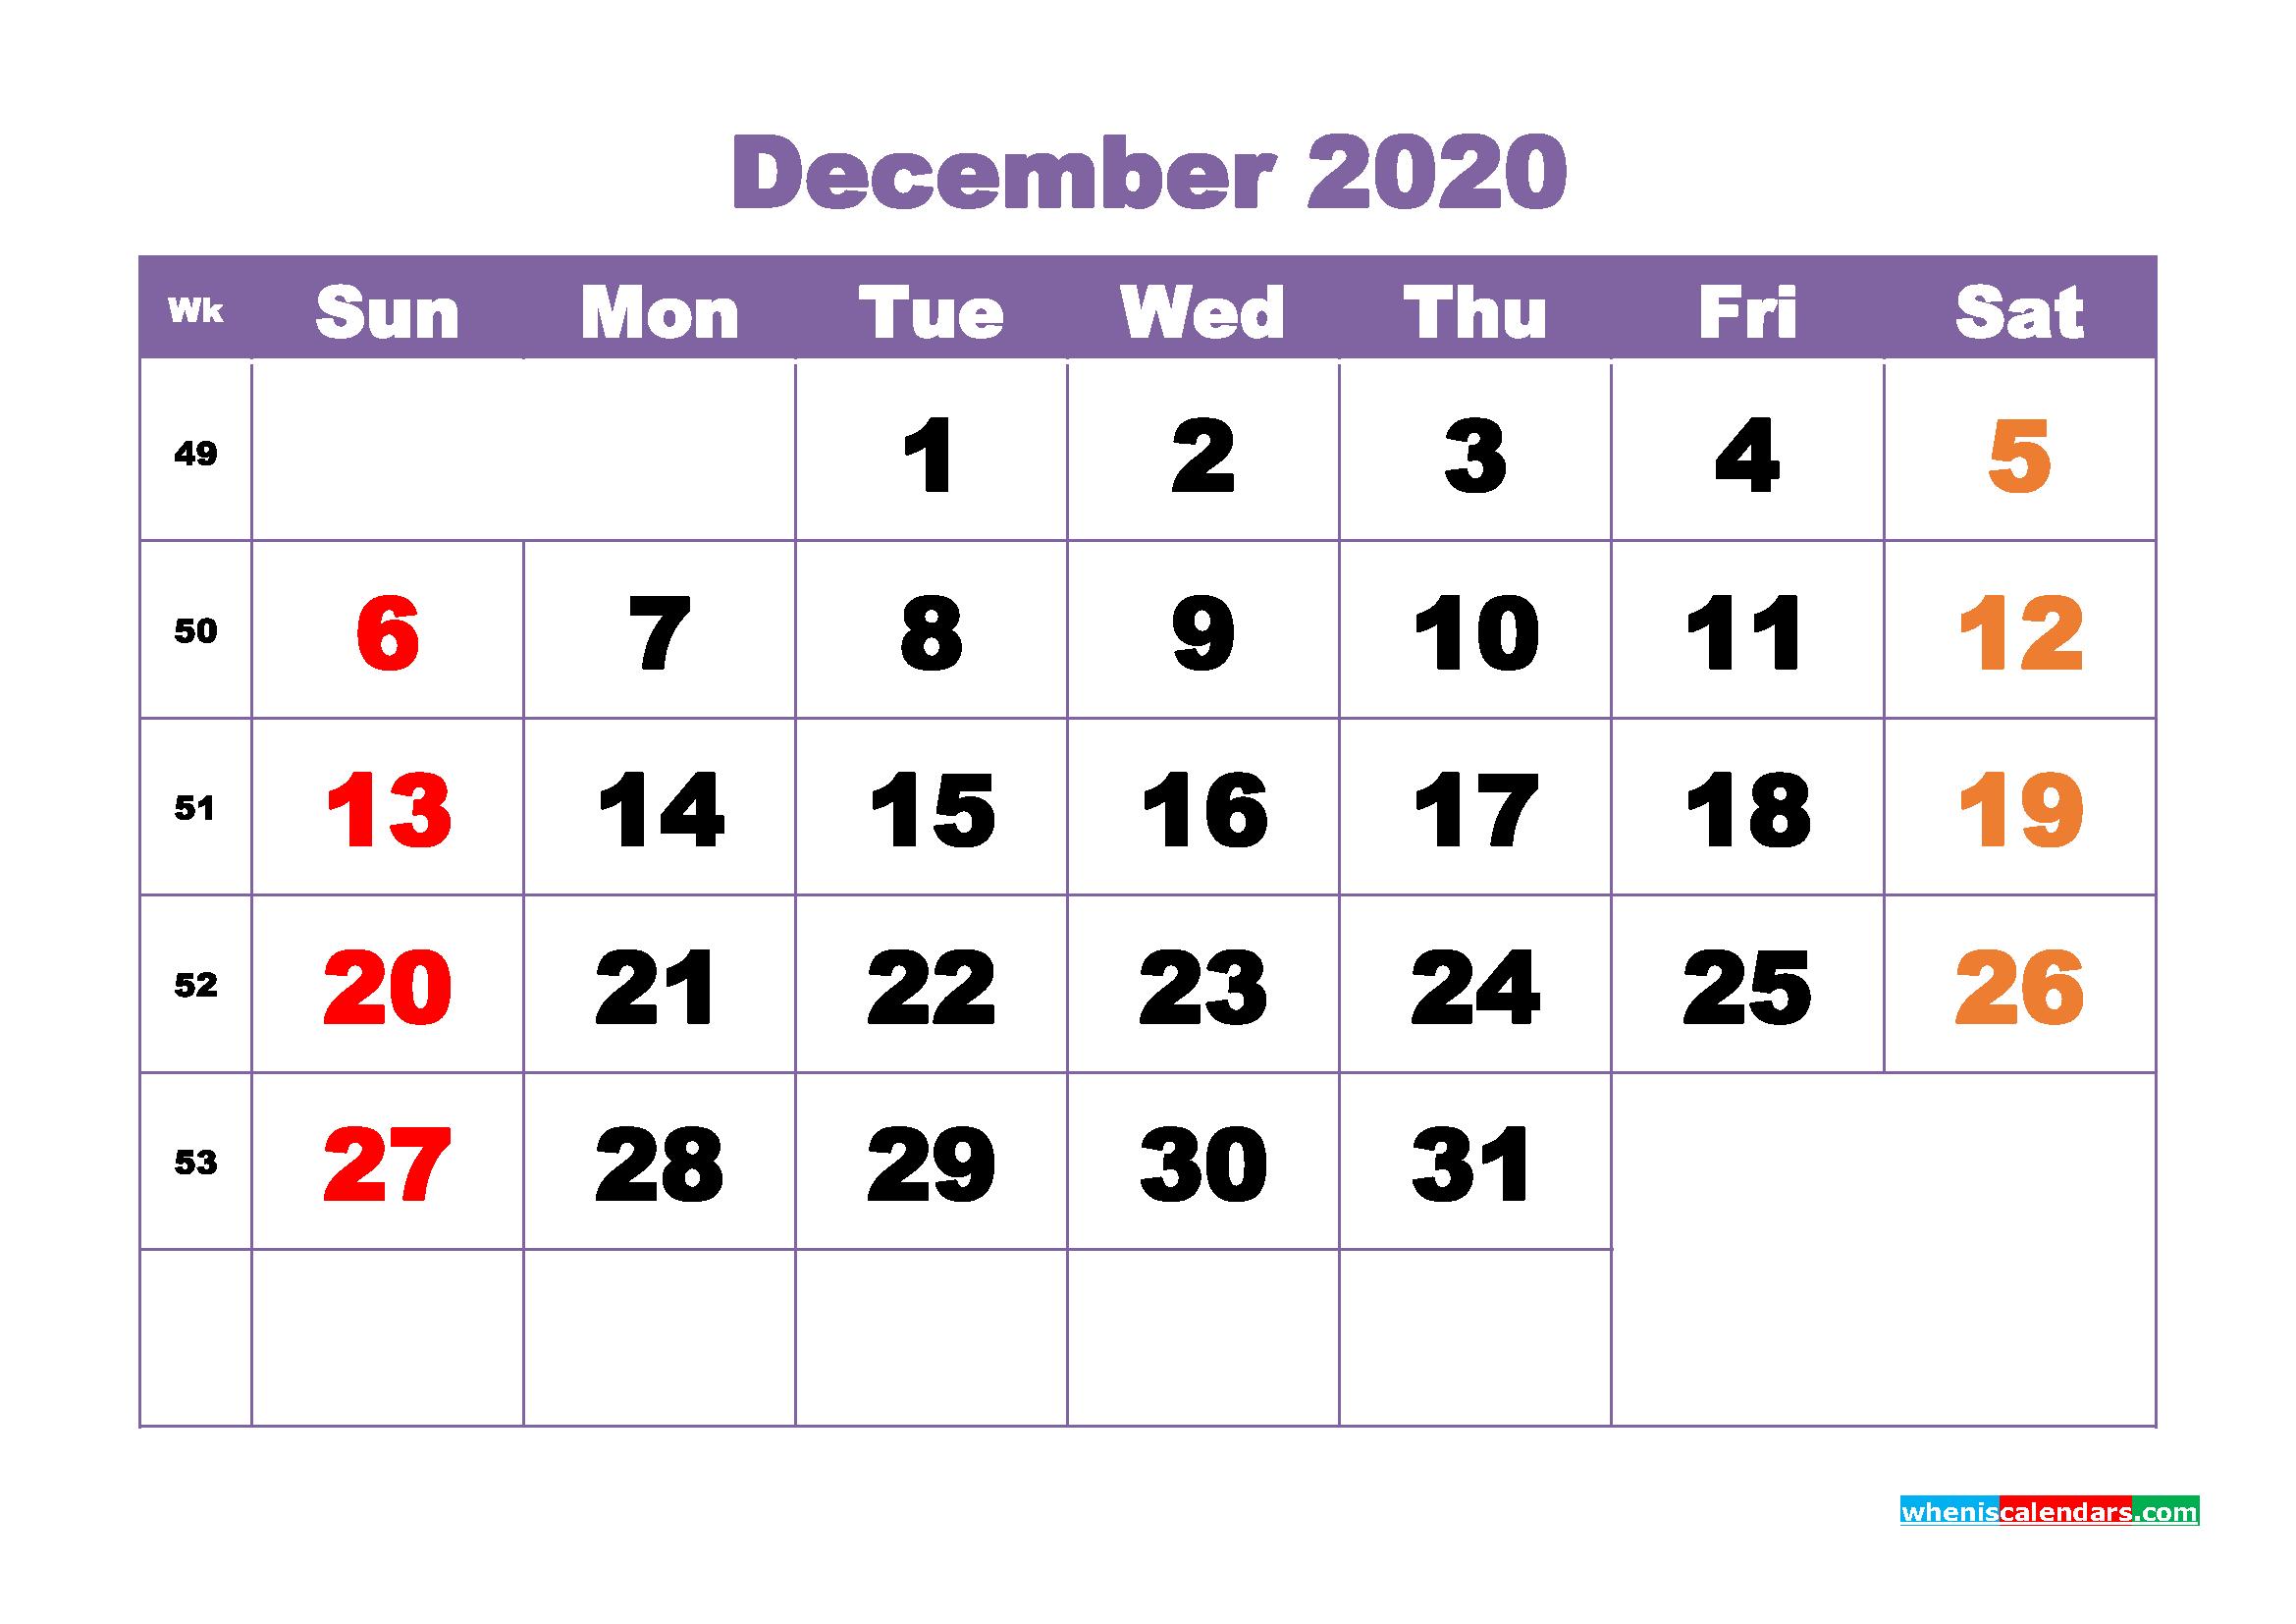 December Printable Calendar 2020 PDF, Word - No.m20b384